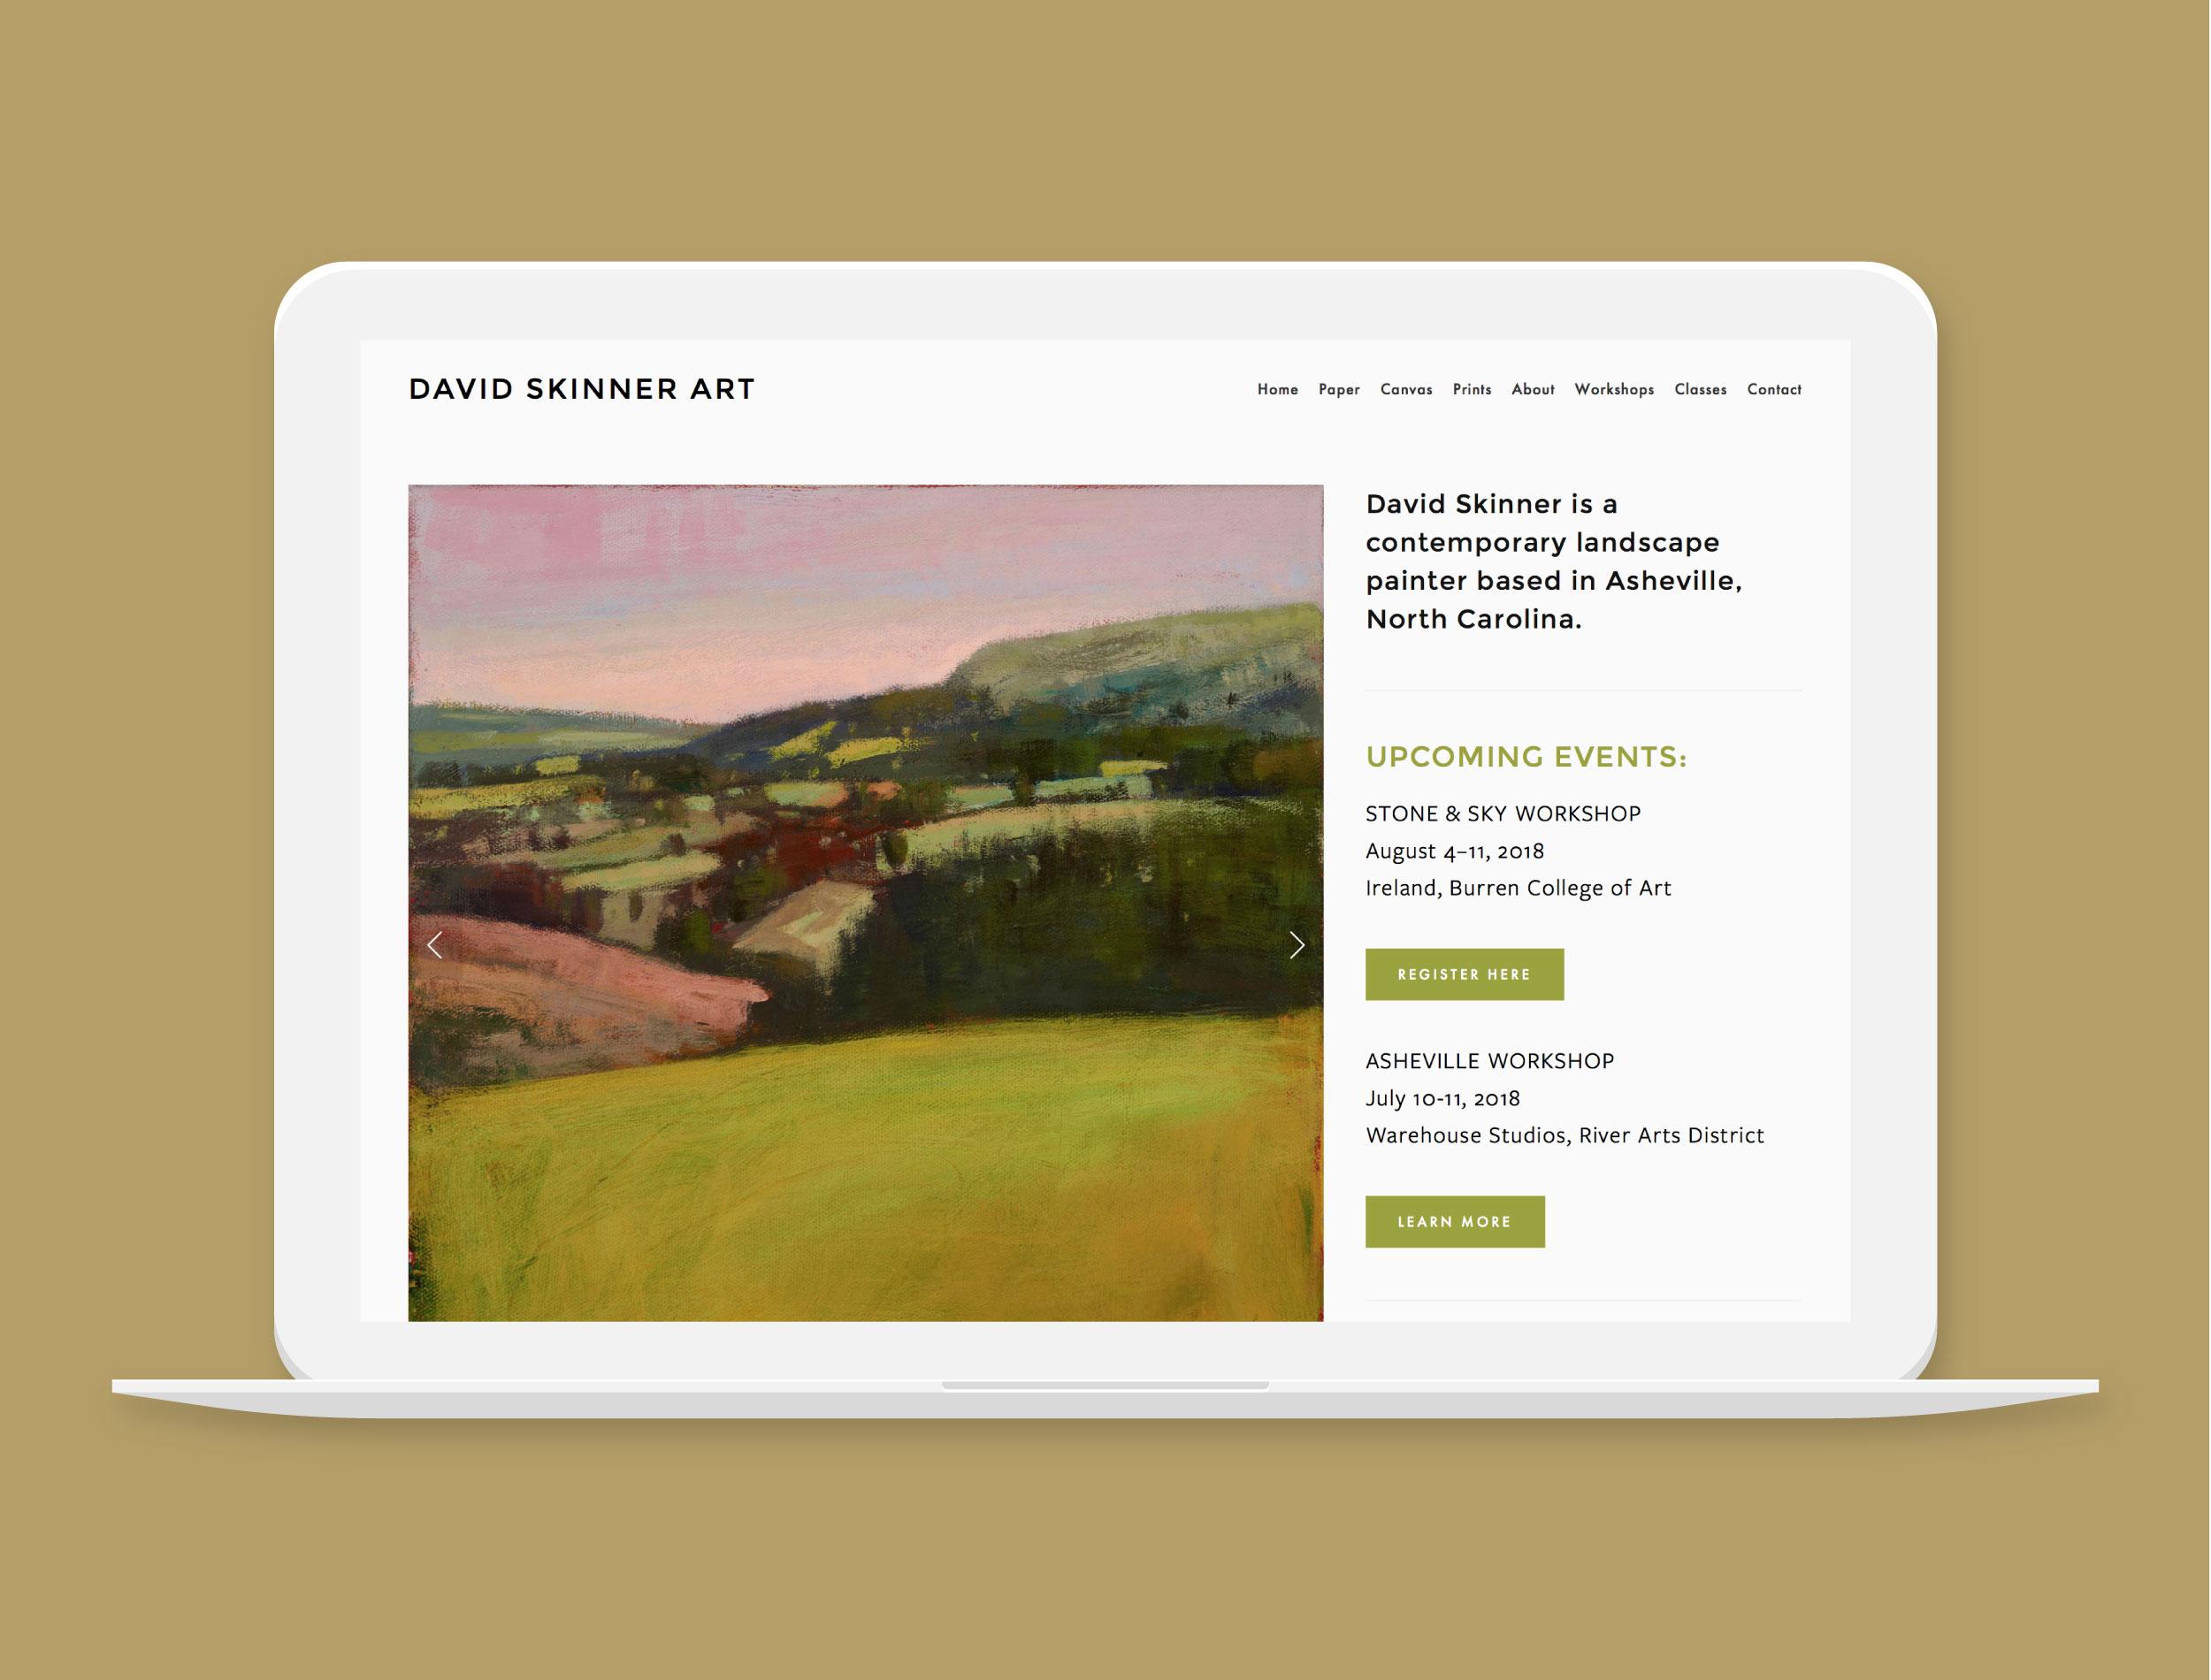 David Skinner Art   Asheville Contemporary Painter   Project Details   Visit Website